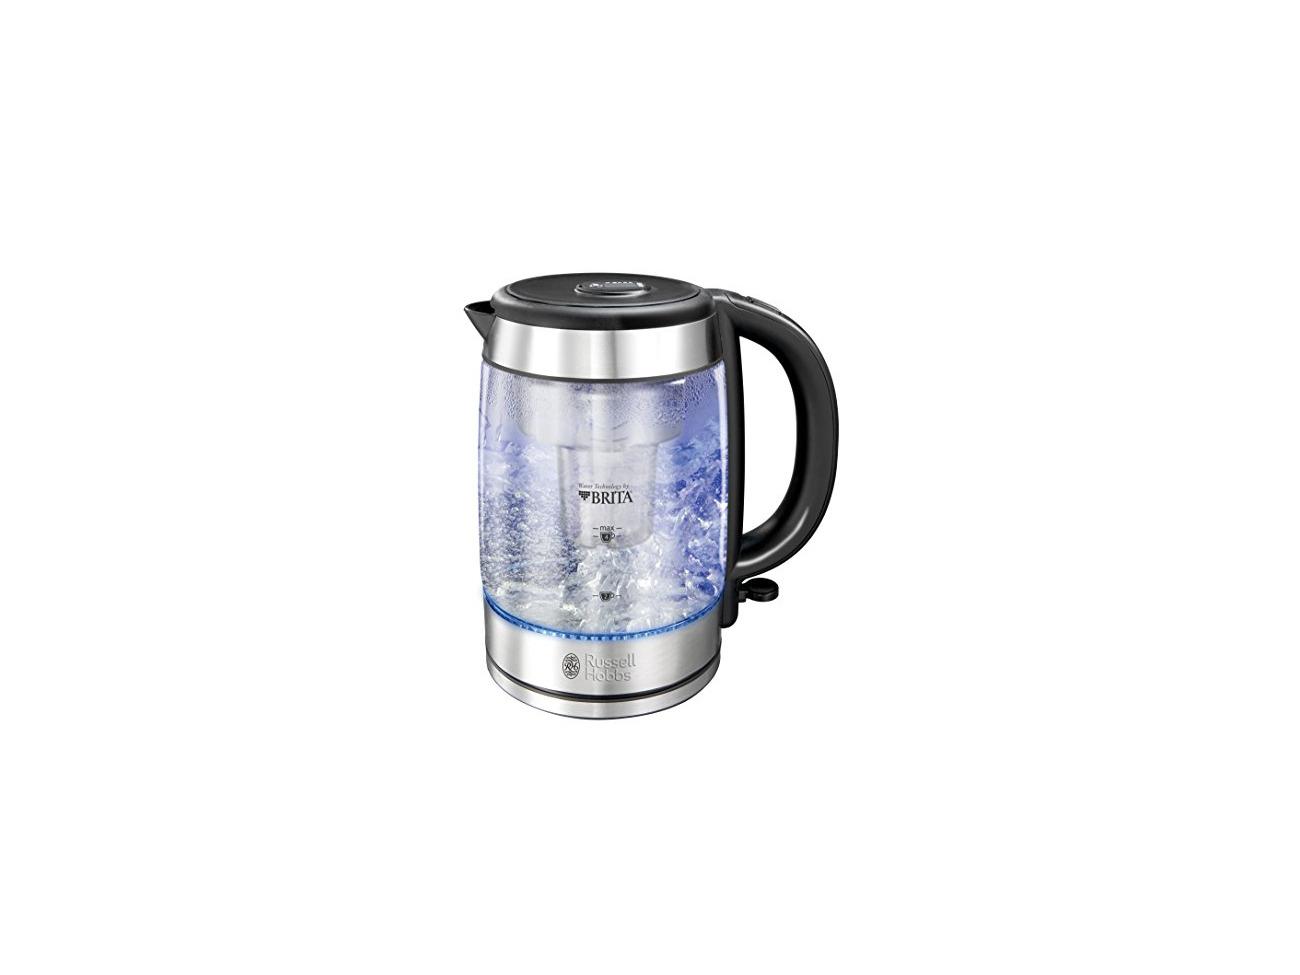 Russell Hobbs Aqua Purity Filter Kettle